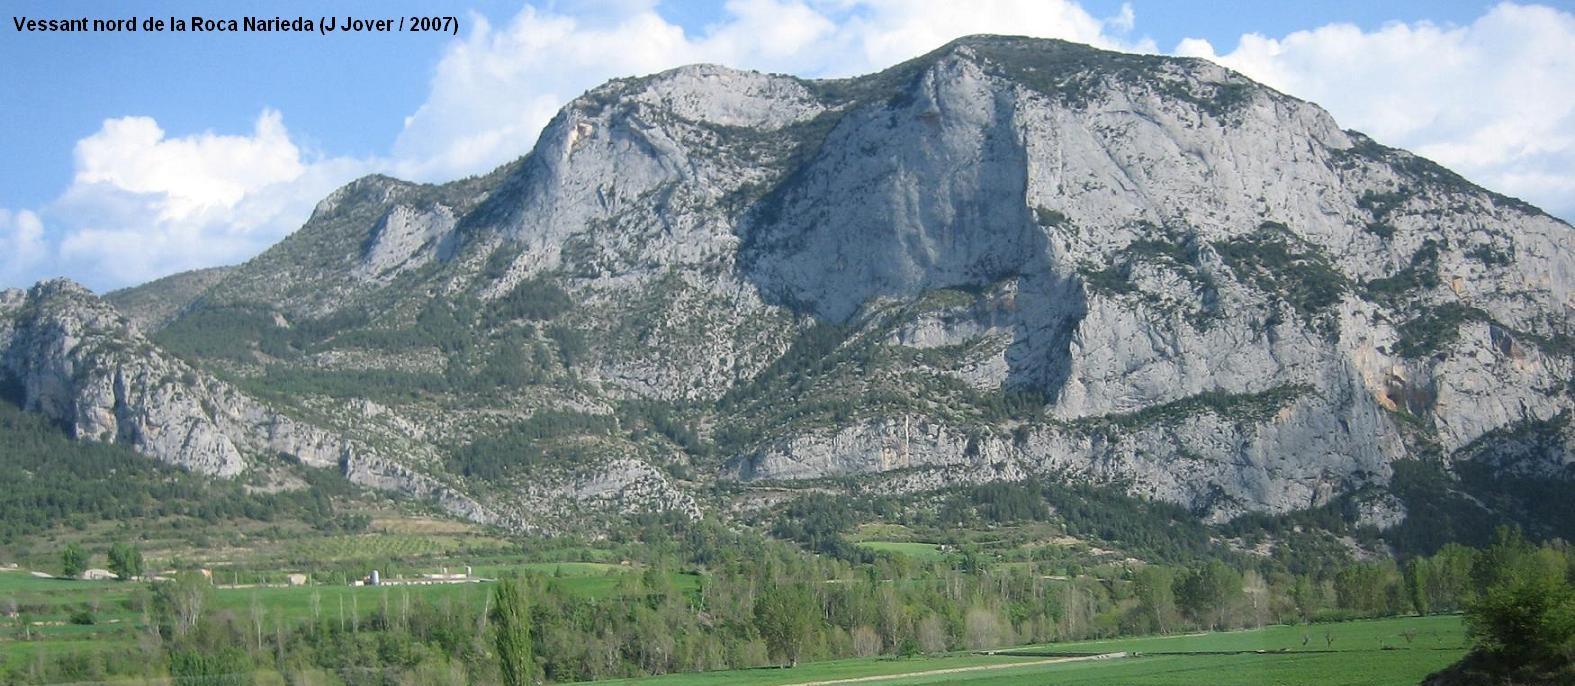 Tossal de baliny roca narieda via pacnopot xelo bam for Roca de guia